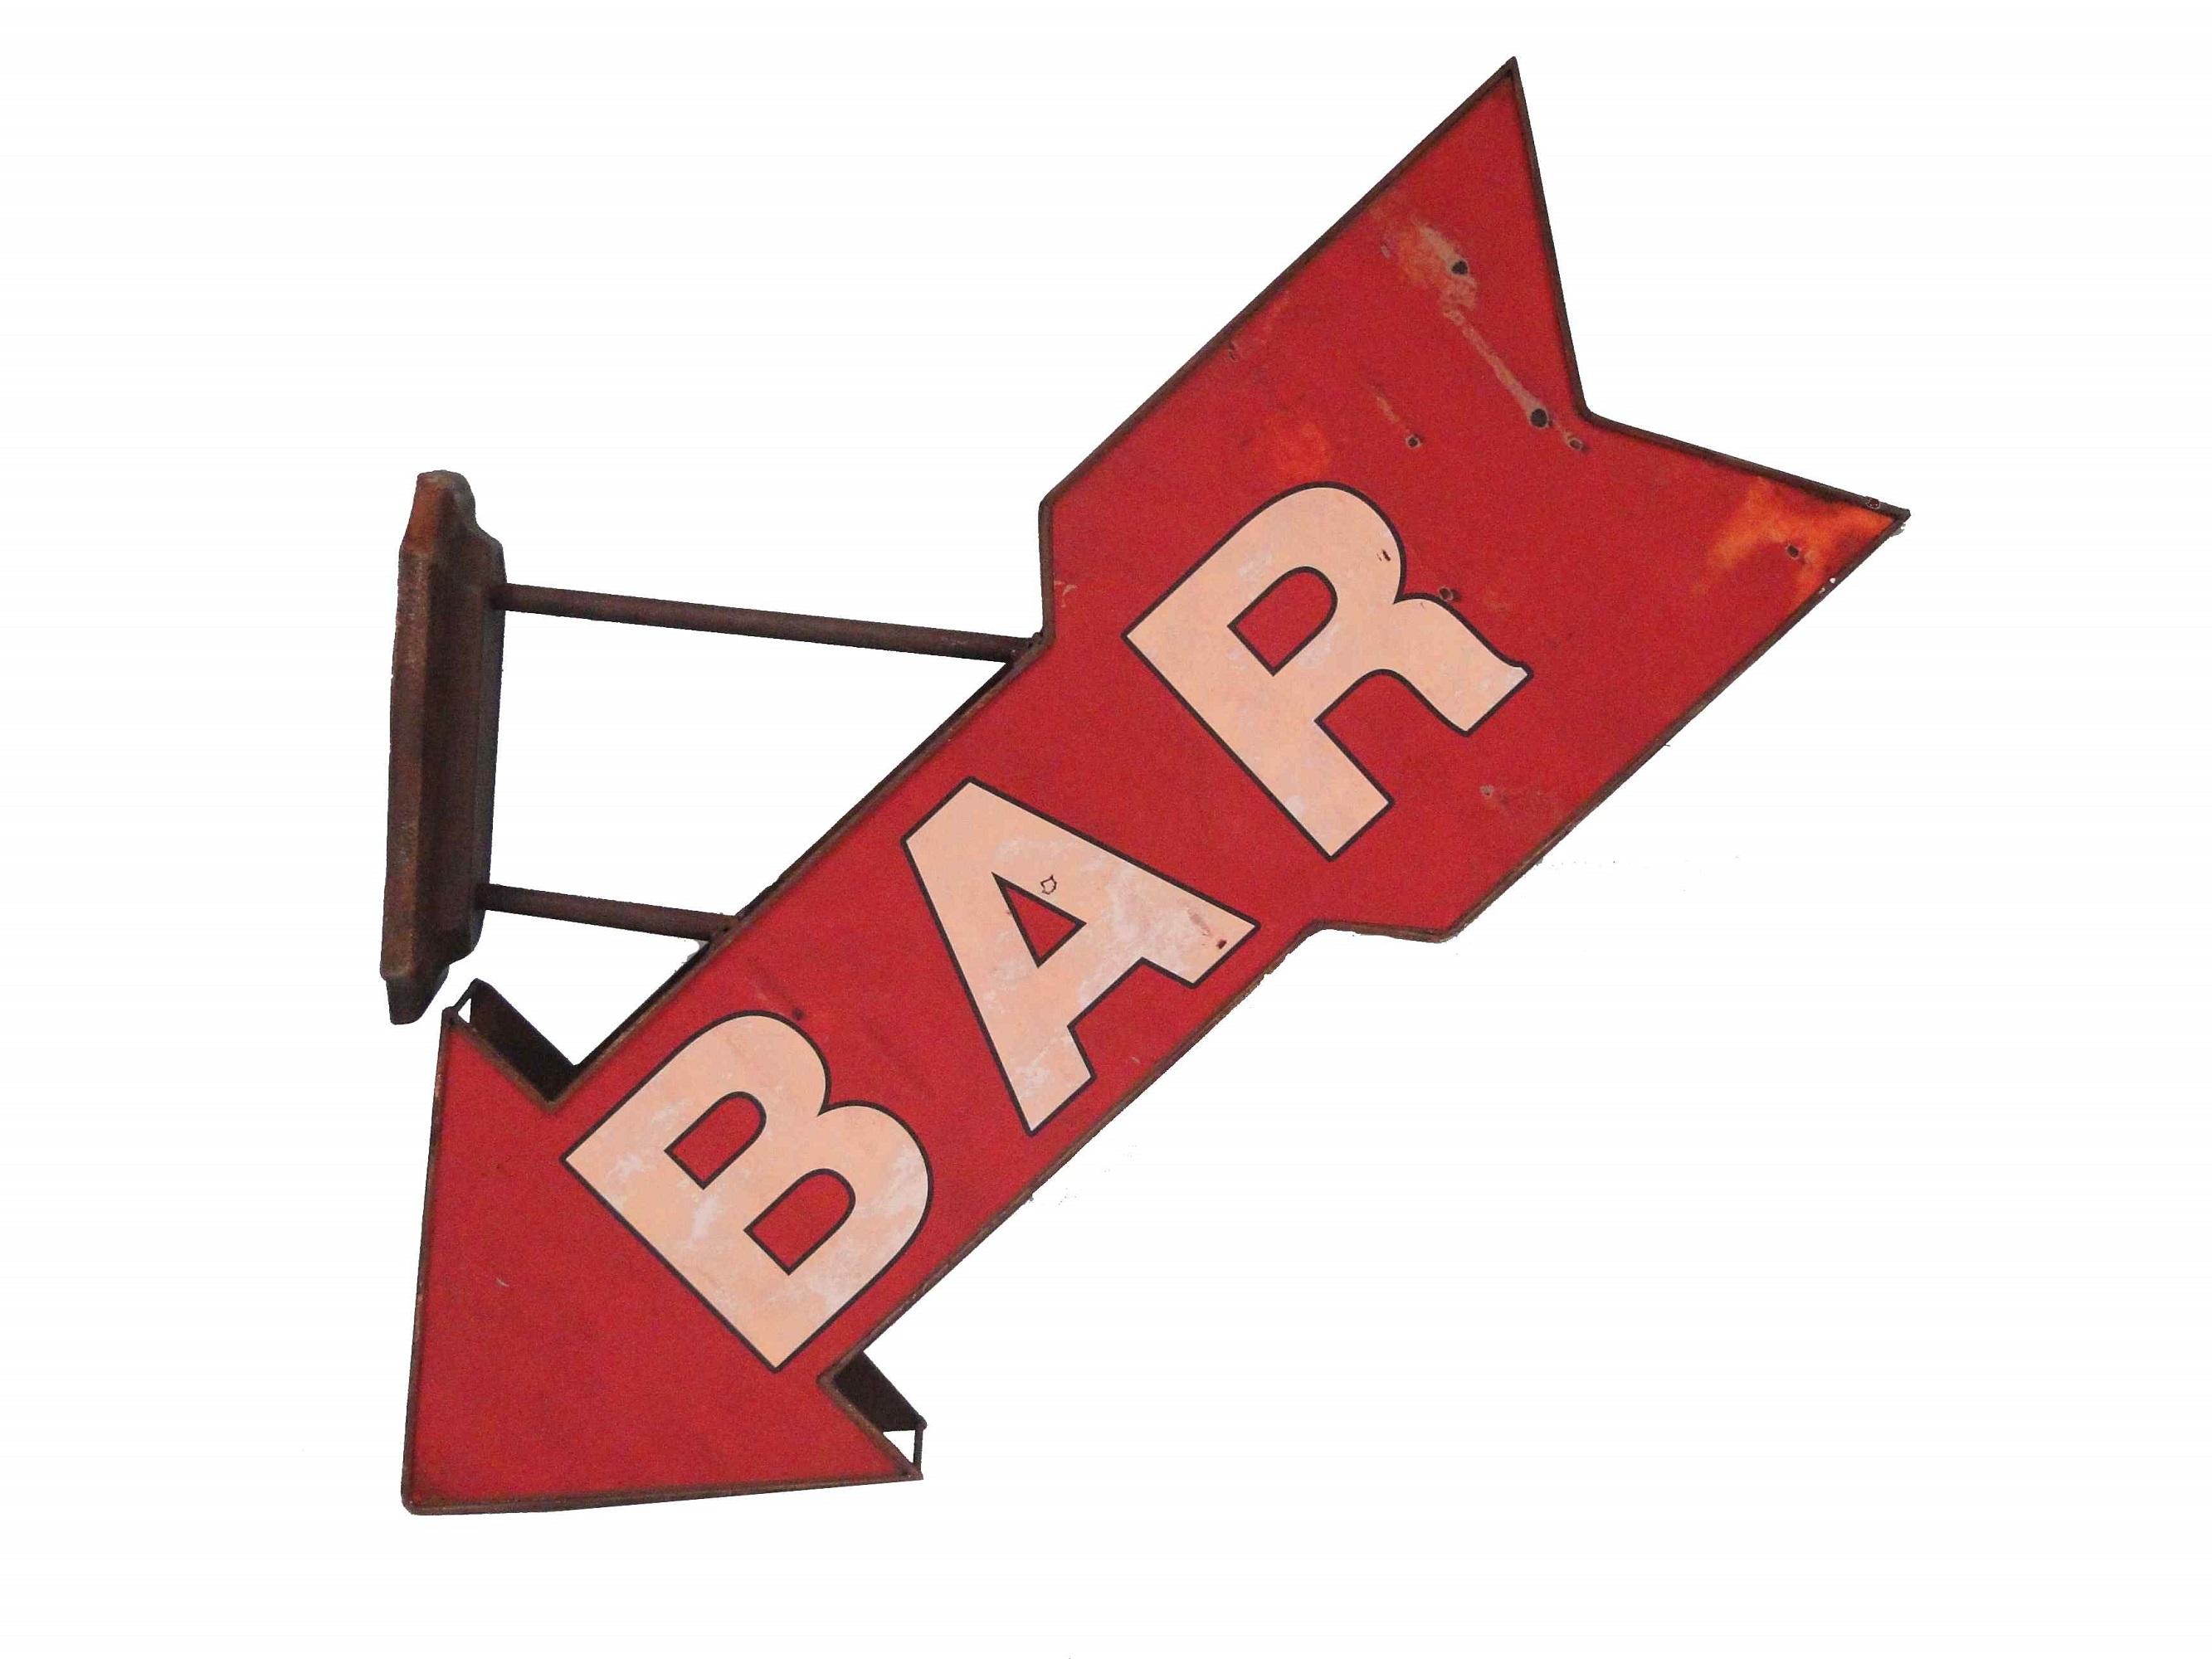 Знак BarДругое<br><br><br>Material: Железо<br>Ширина см: 53<br>Высота см: 57<br>Глубина см: 10